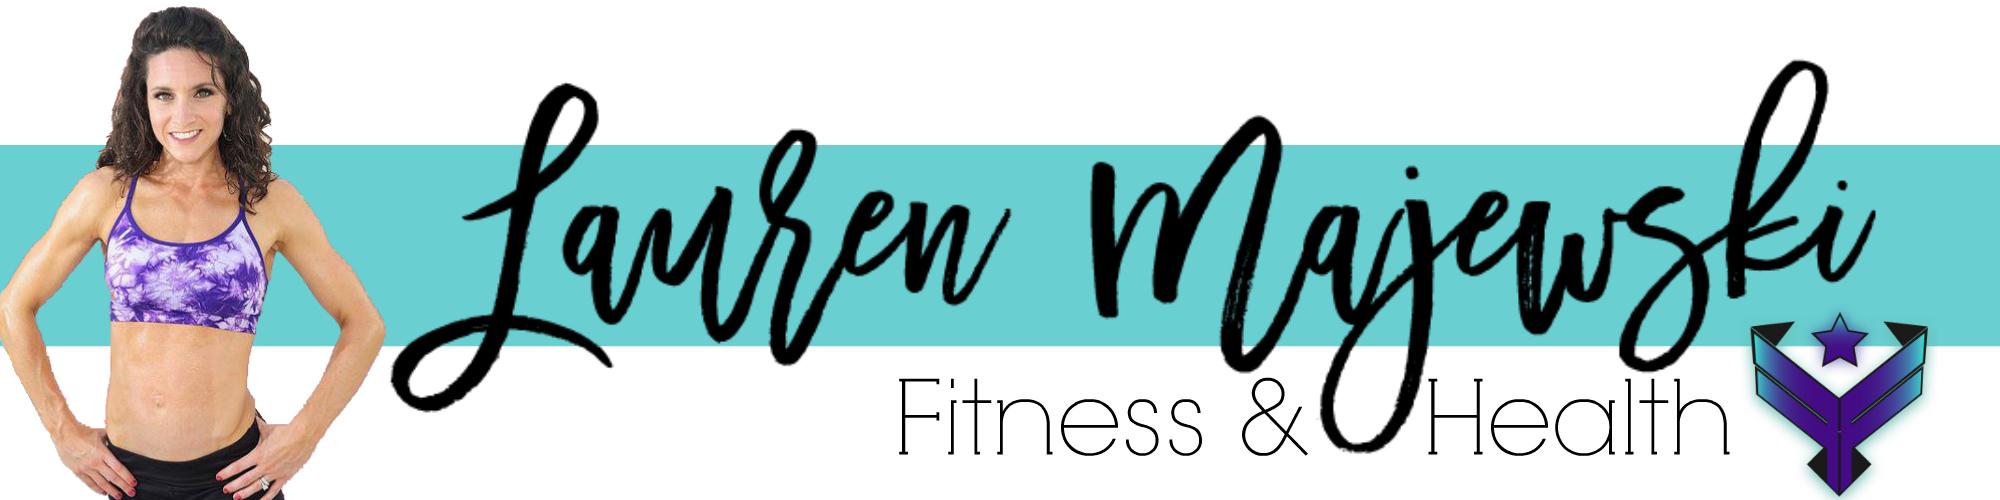 Lauren Majewski Fitness & Health